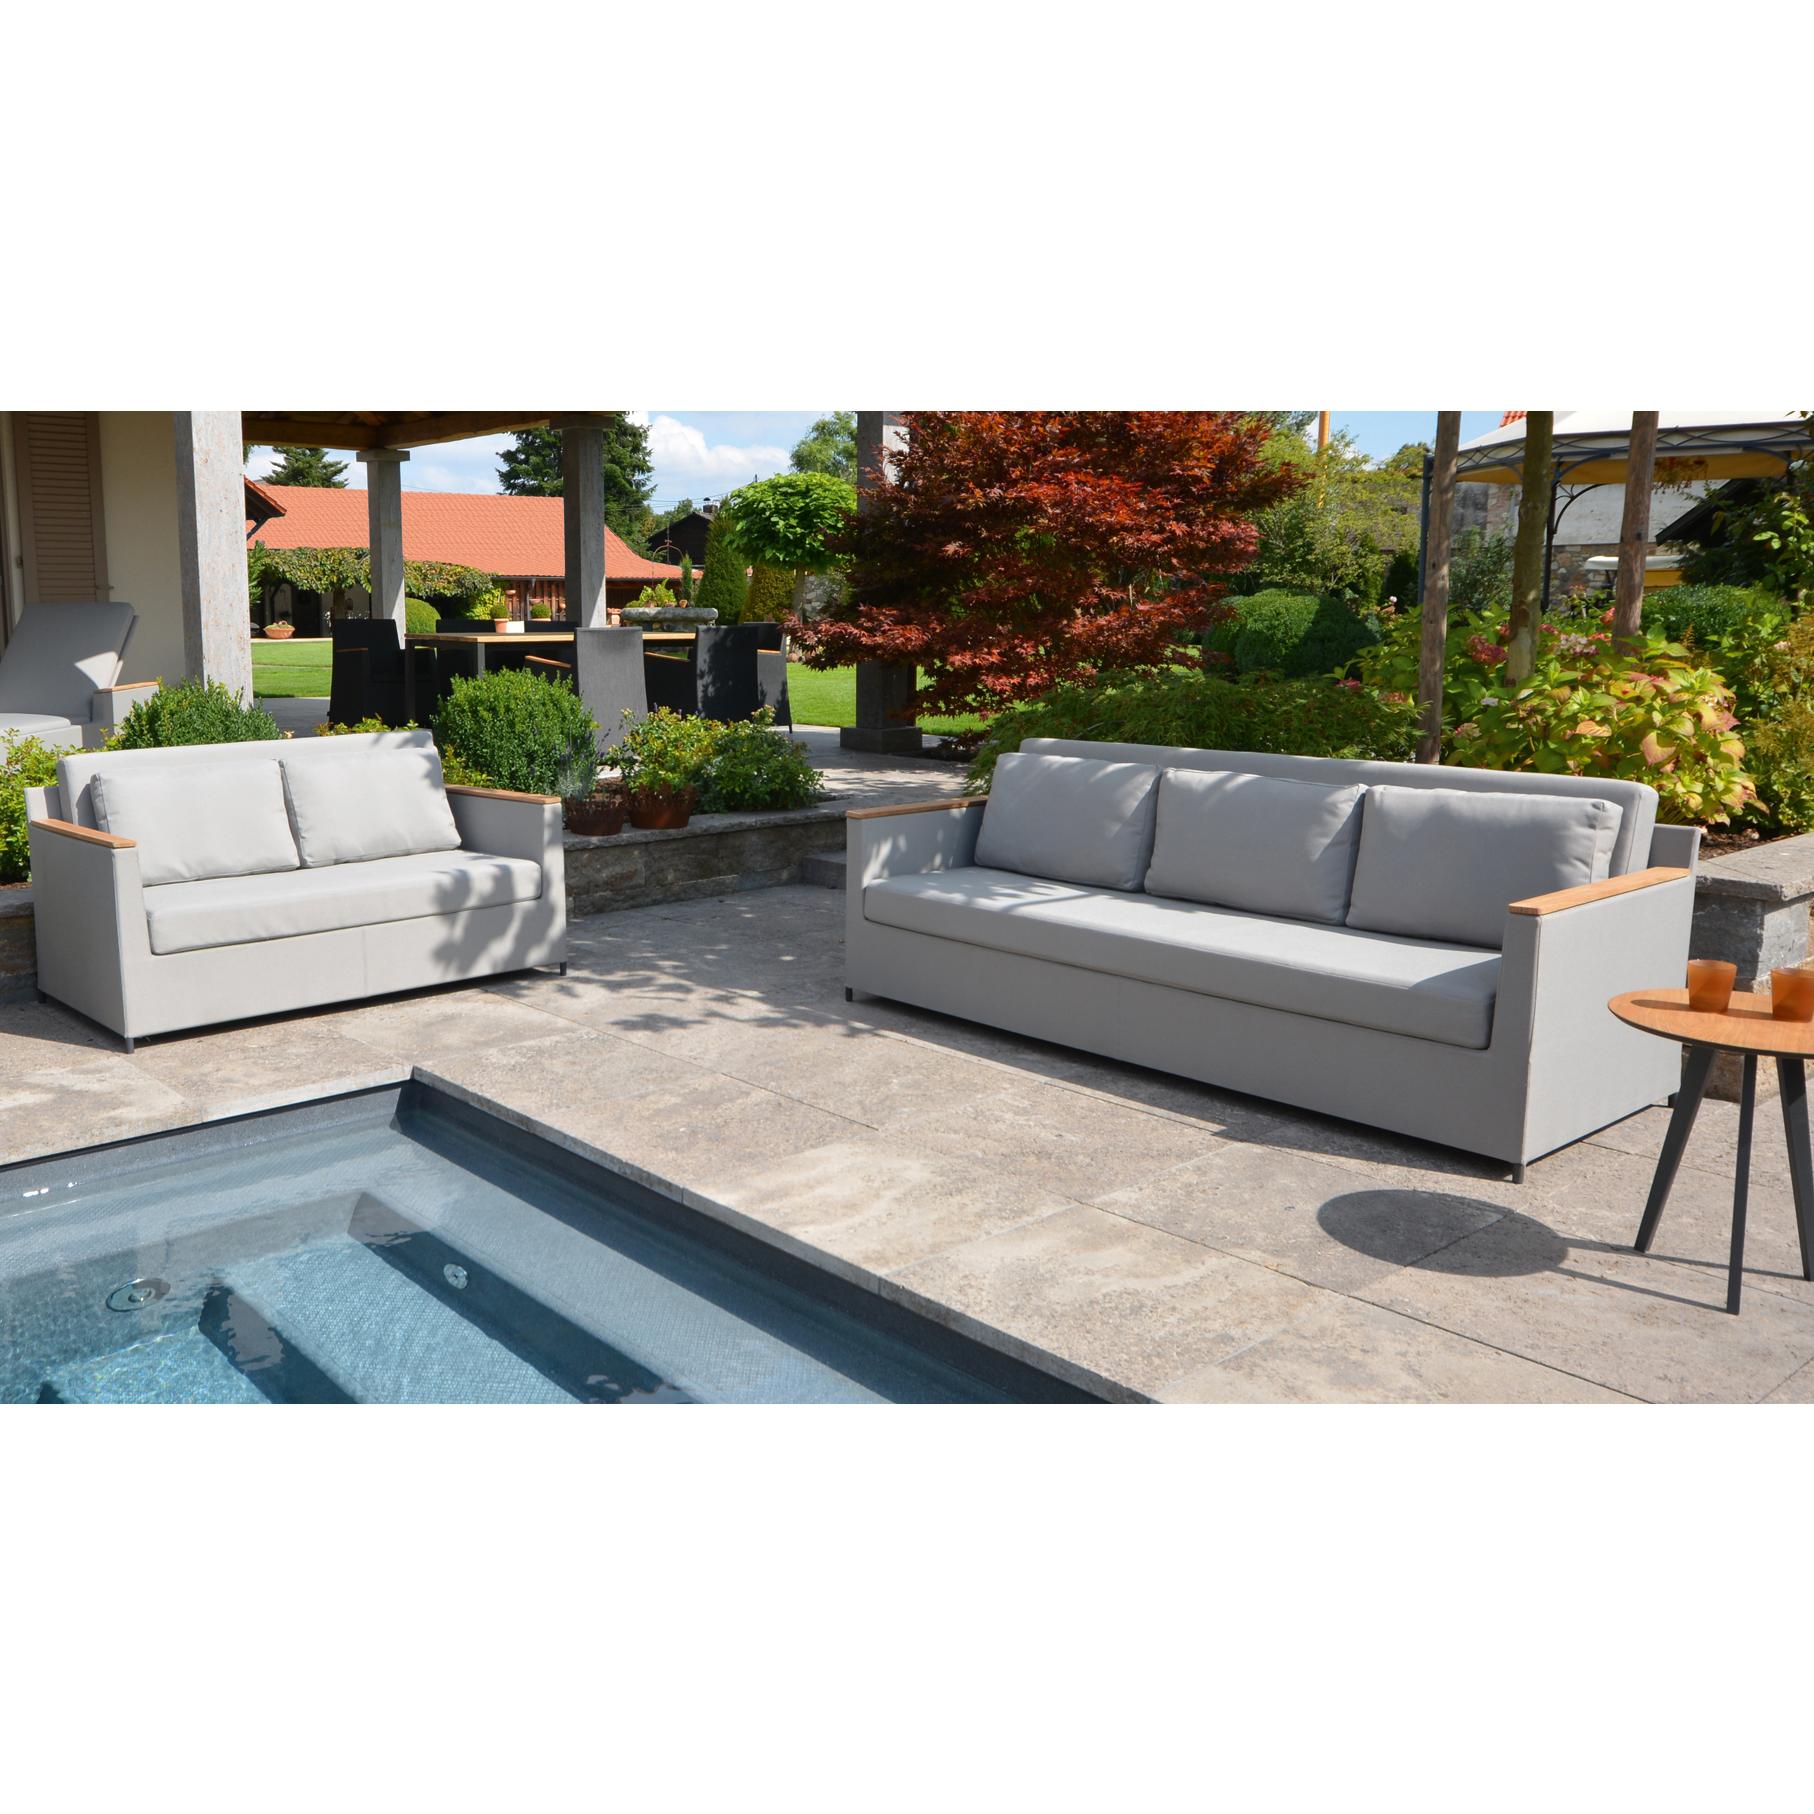 fischer m bel rio loungesofa 3 sitzer. Black Bedroom Furniture Sets. Home Design Ideas